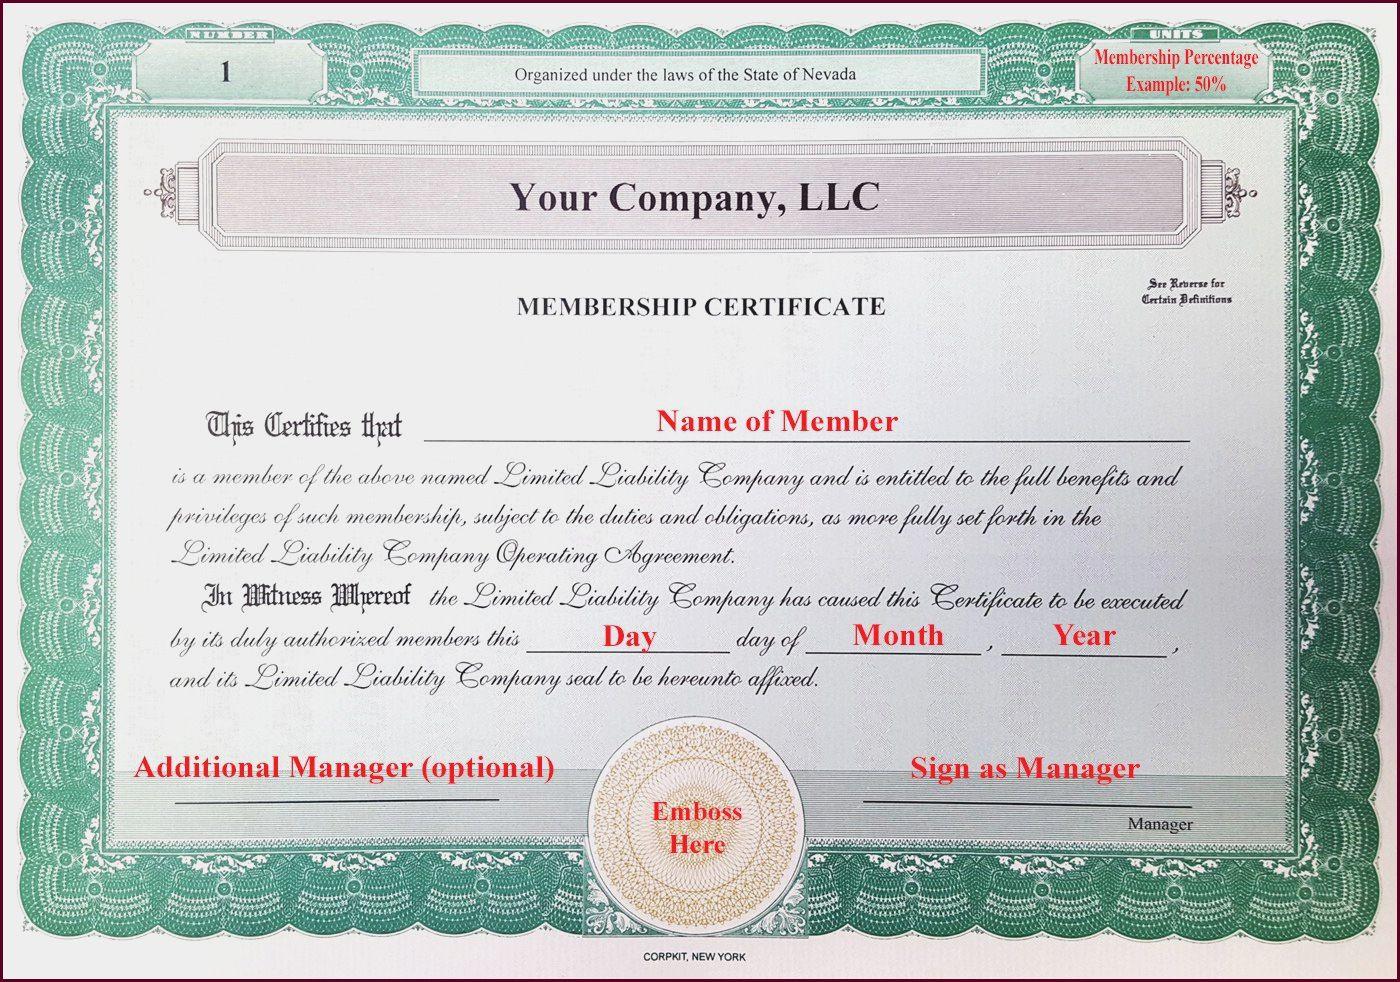 Llc Membership Certificate Template Word Colona Rsd7 With Llc Membership Certificate Tem In 2021 Certificate Templates Certificates Online Birth Certificate Template Llc membership certificate template free